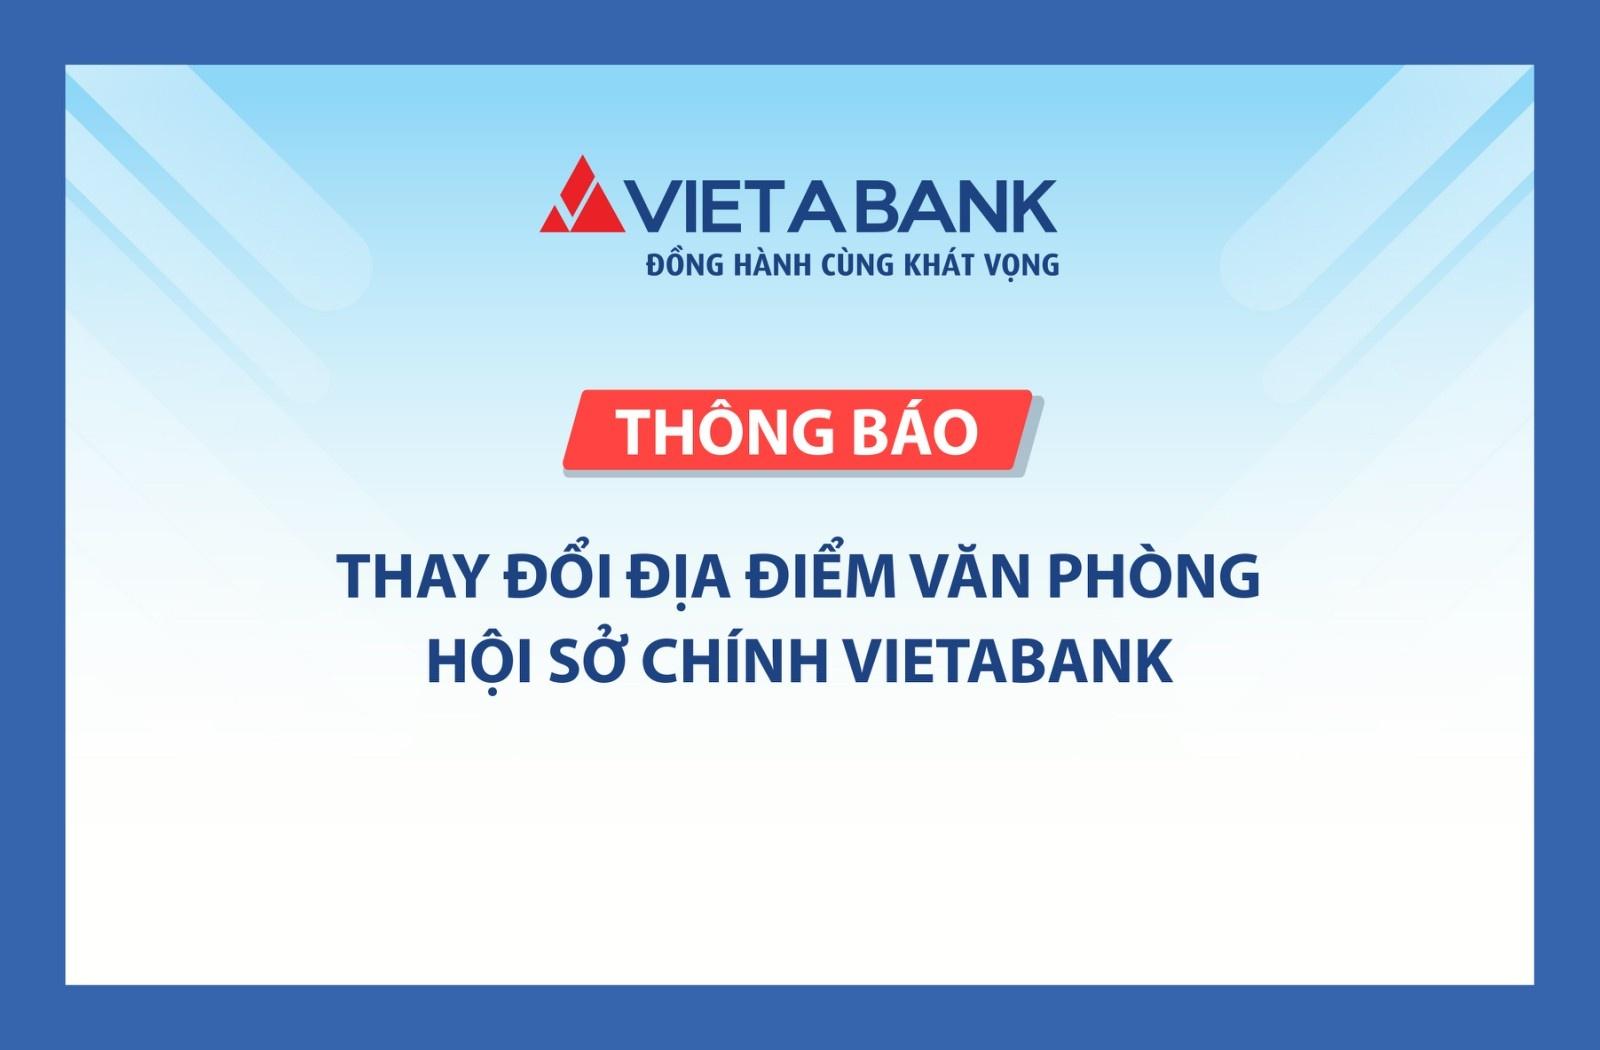 vietabank thay doi dia diem van phong hoi so chinh